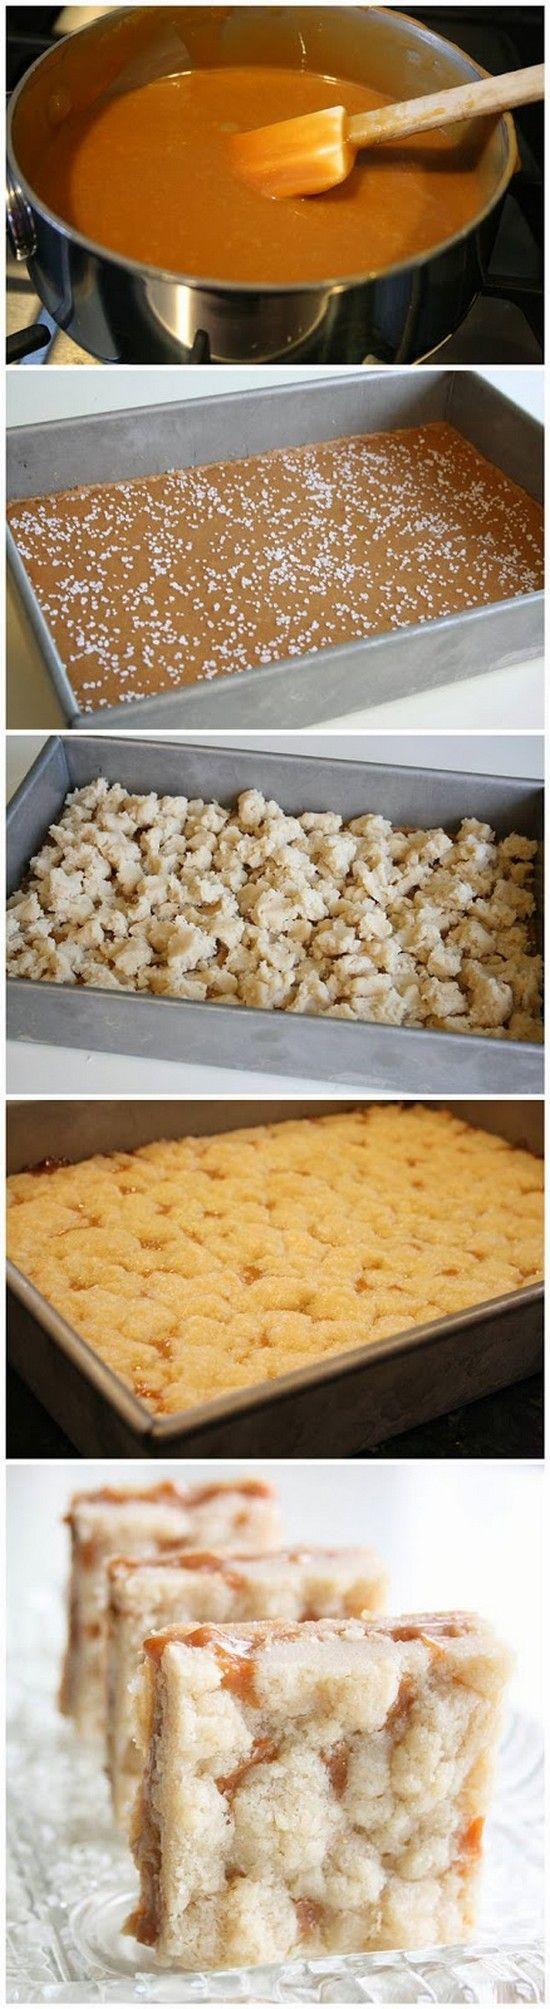 Salted Caramel Butter Bars Recipe